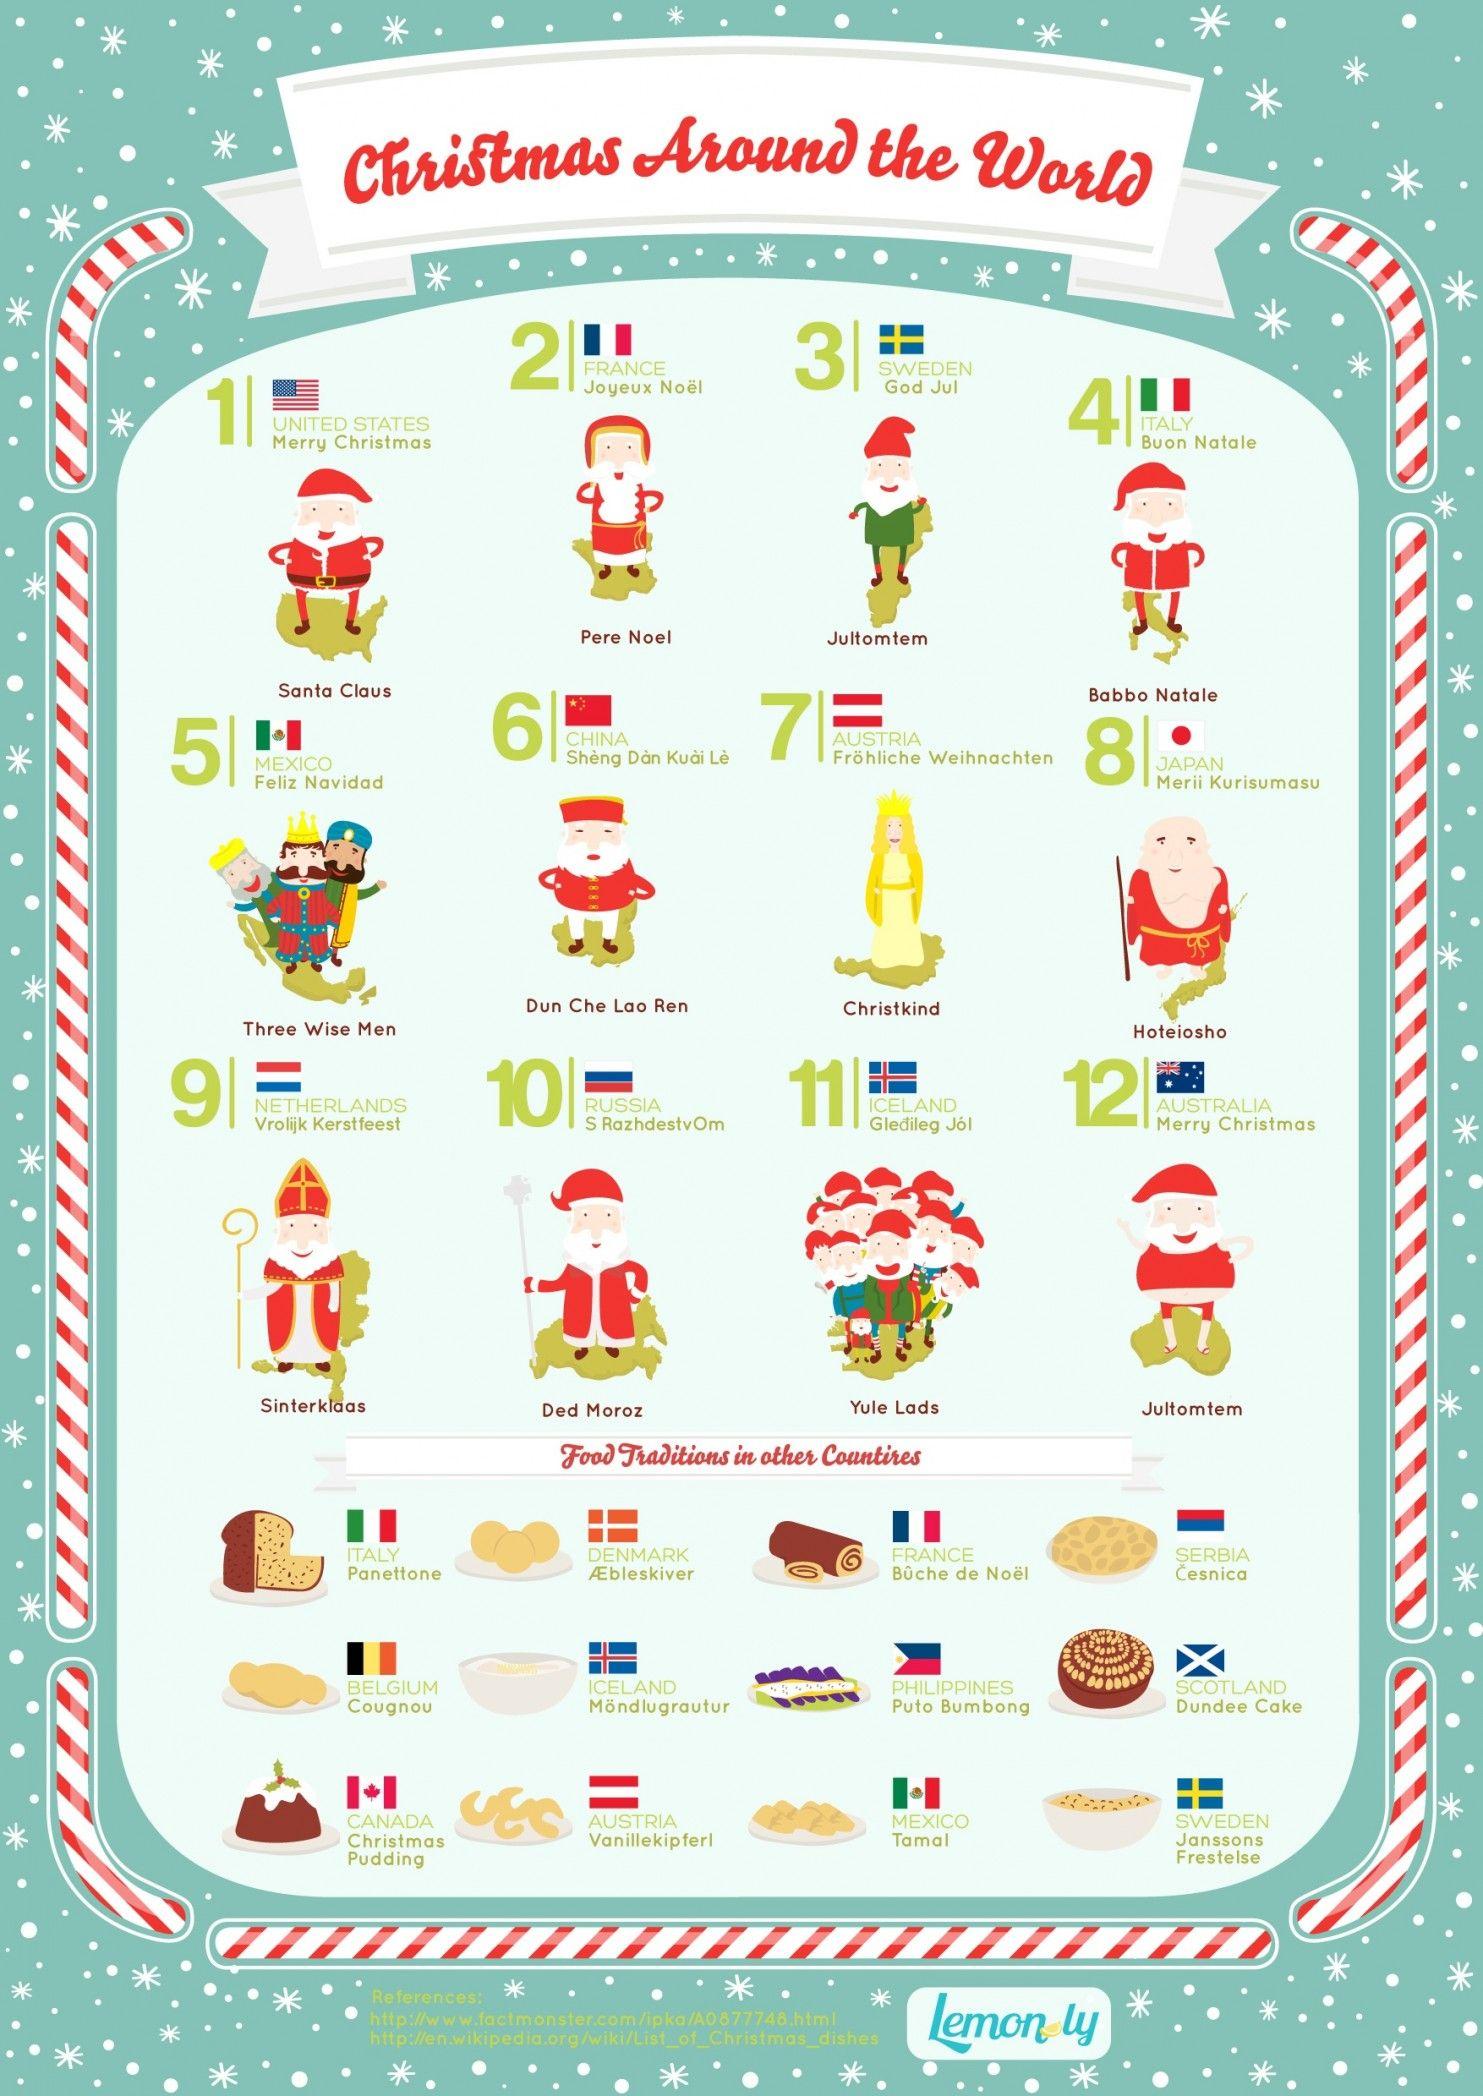 15 christmas around the world when you want to say merry christmas - How Do You Say Merry Christmas In Australia